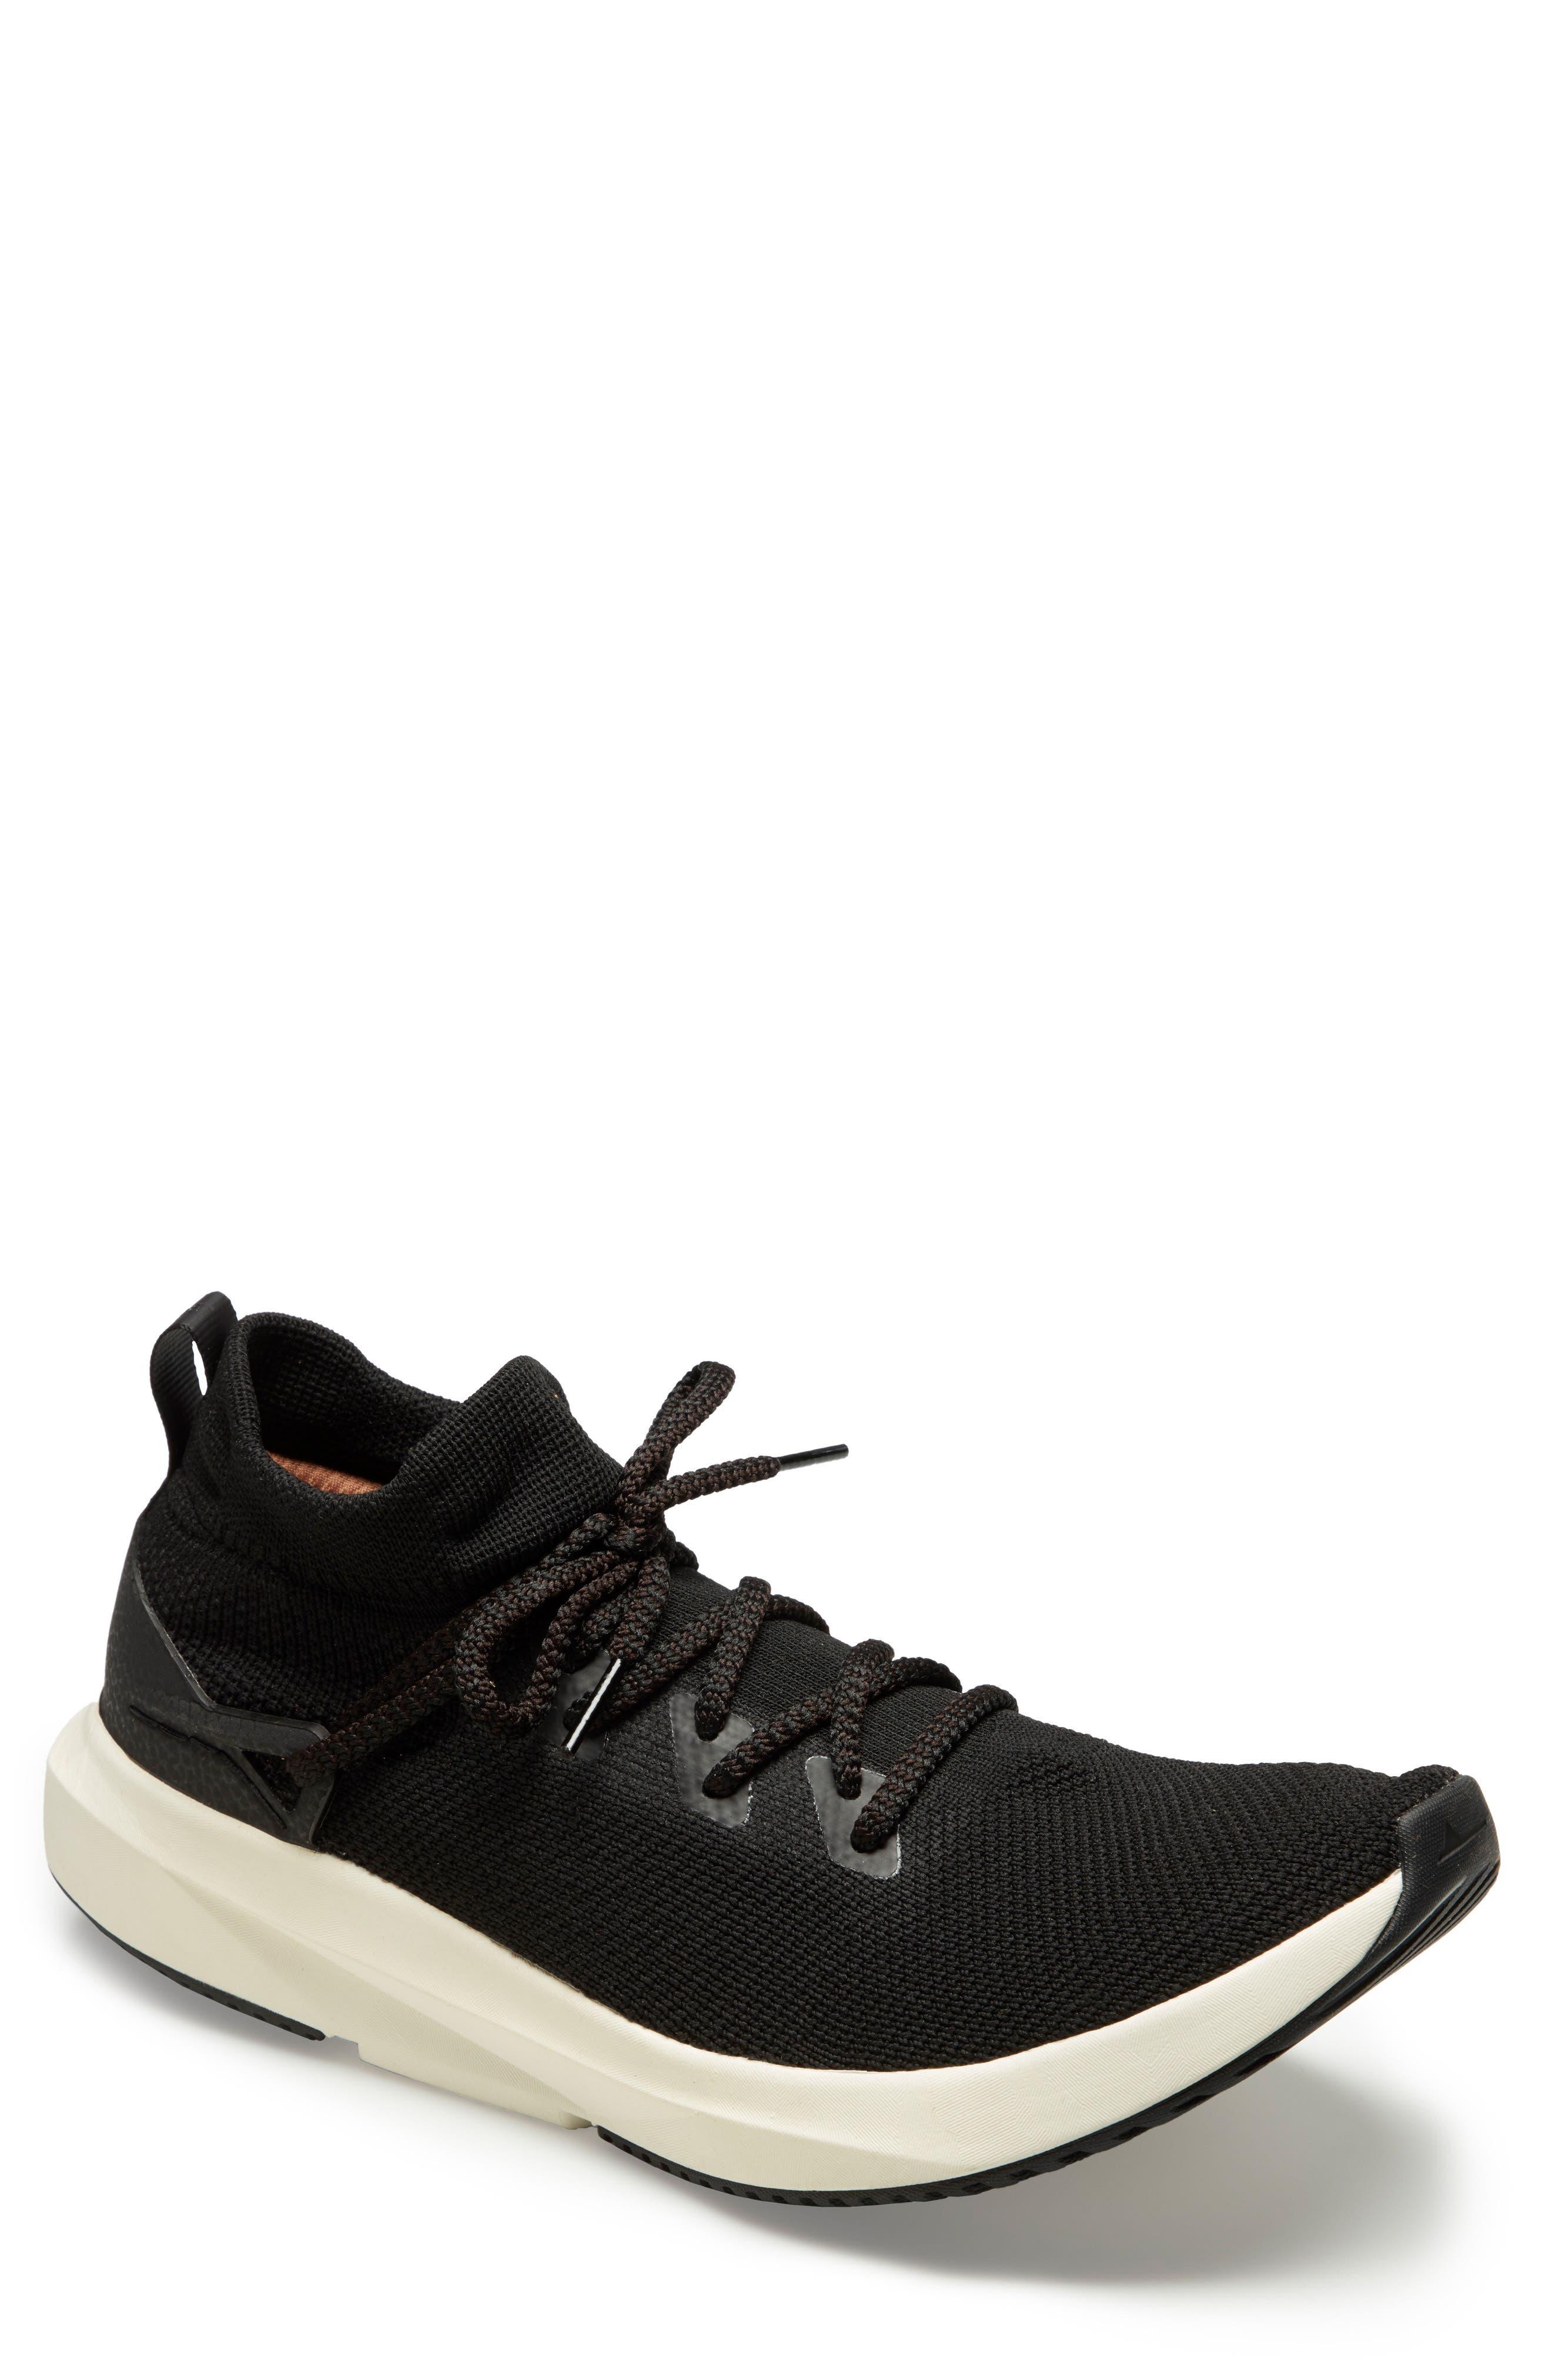 Kaze Sneaker,                         Main,                         color,